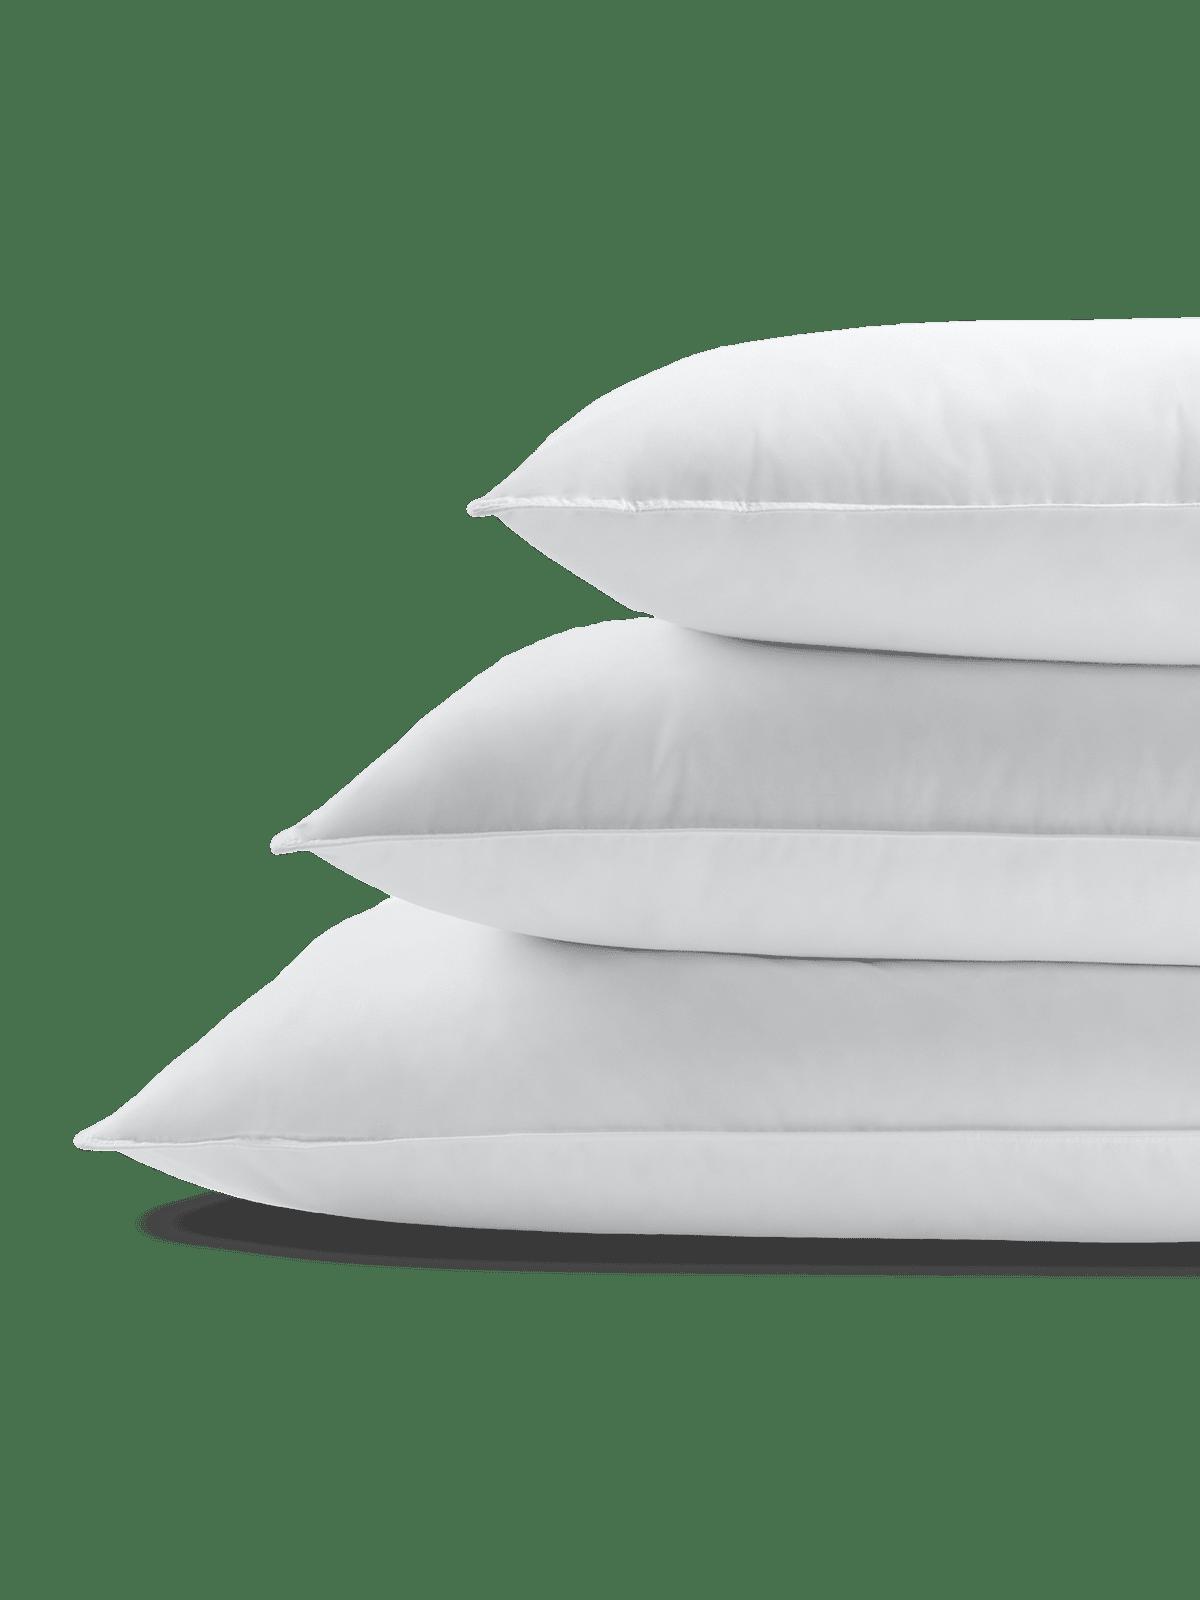 Down & Feather Pillow - Four Seasons